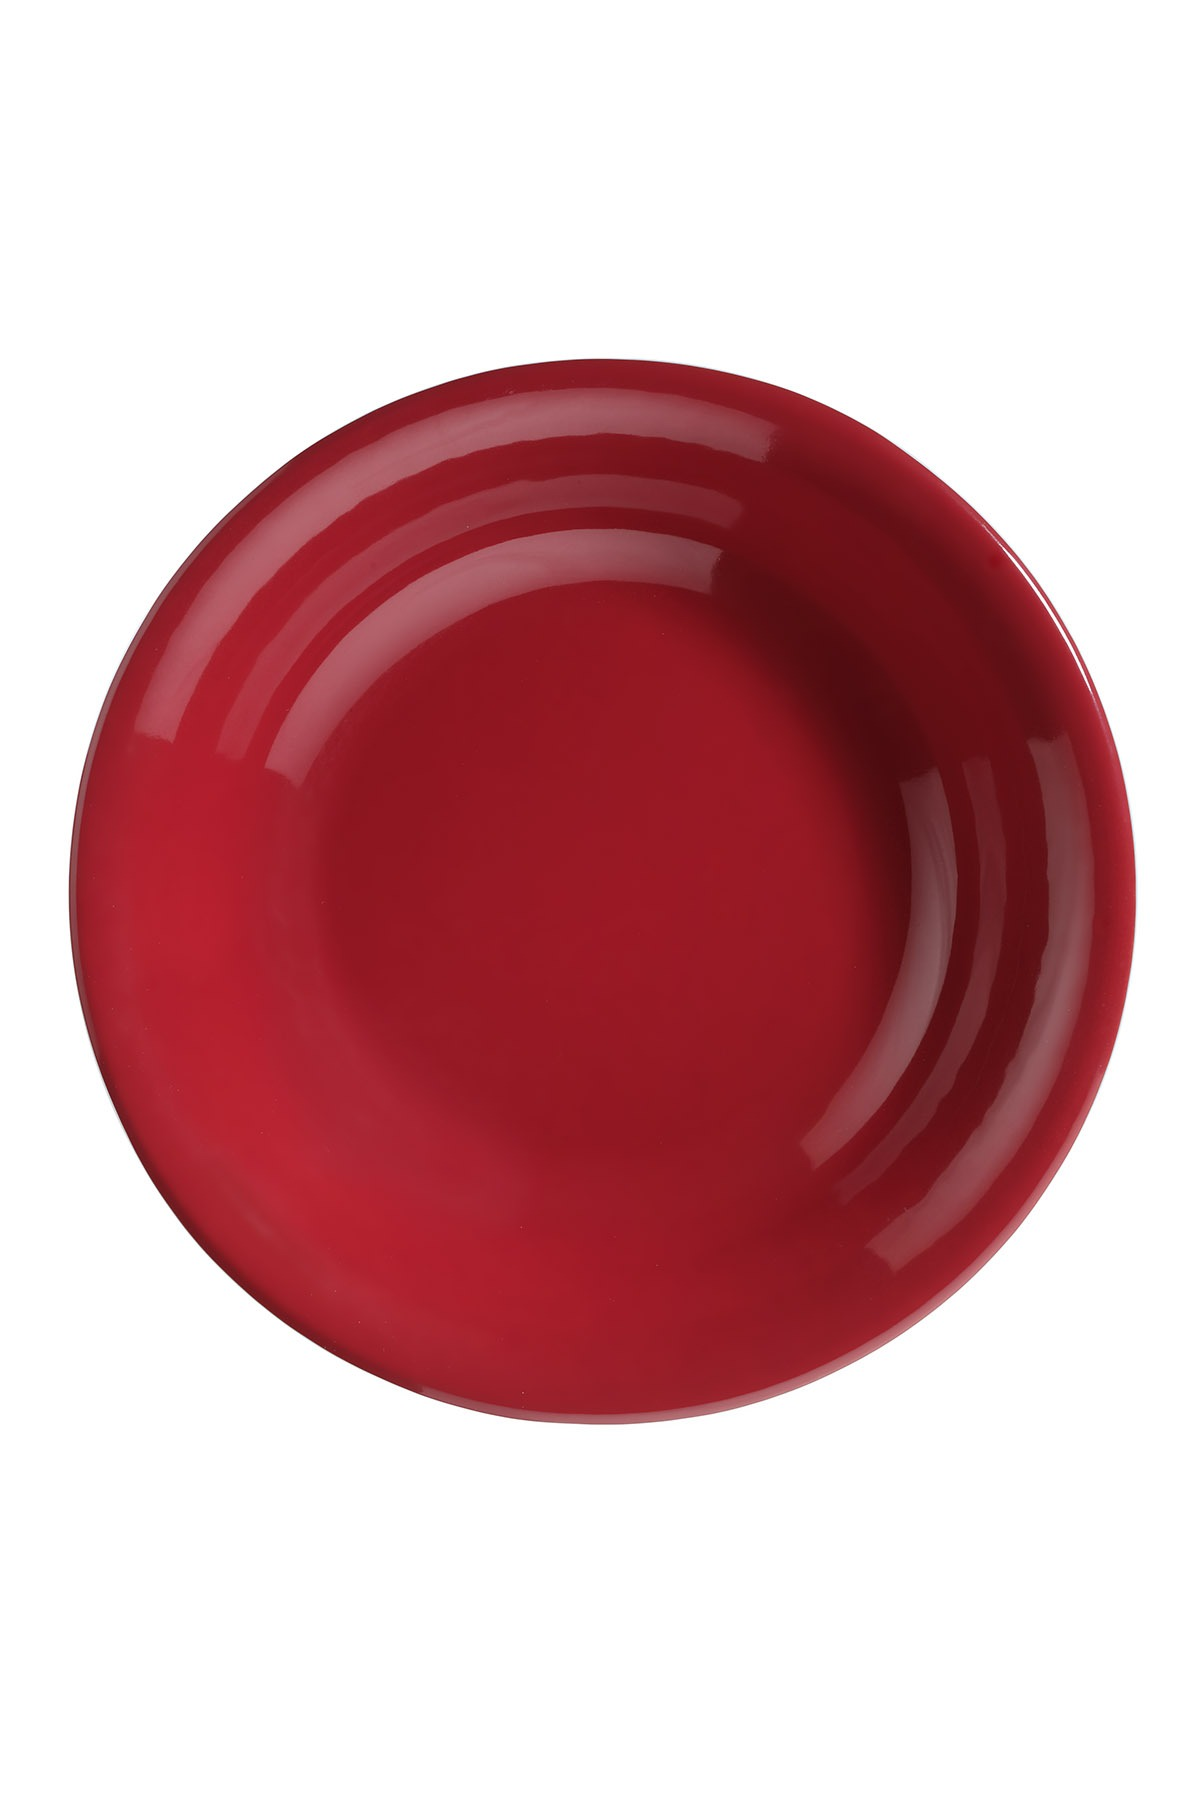 Kütahya Porselen Nanoceram 24 Parça Yemek Seti 880155